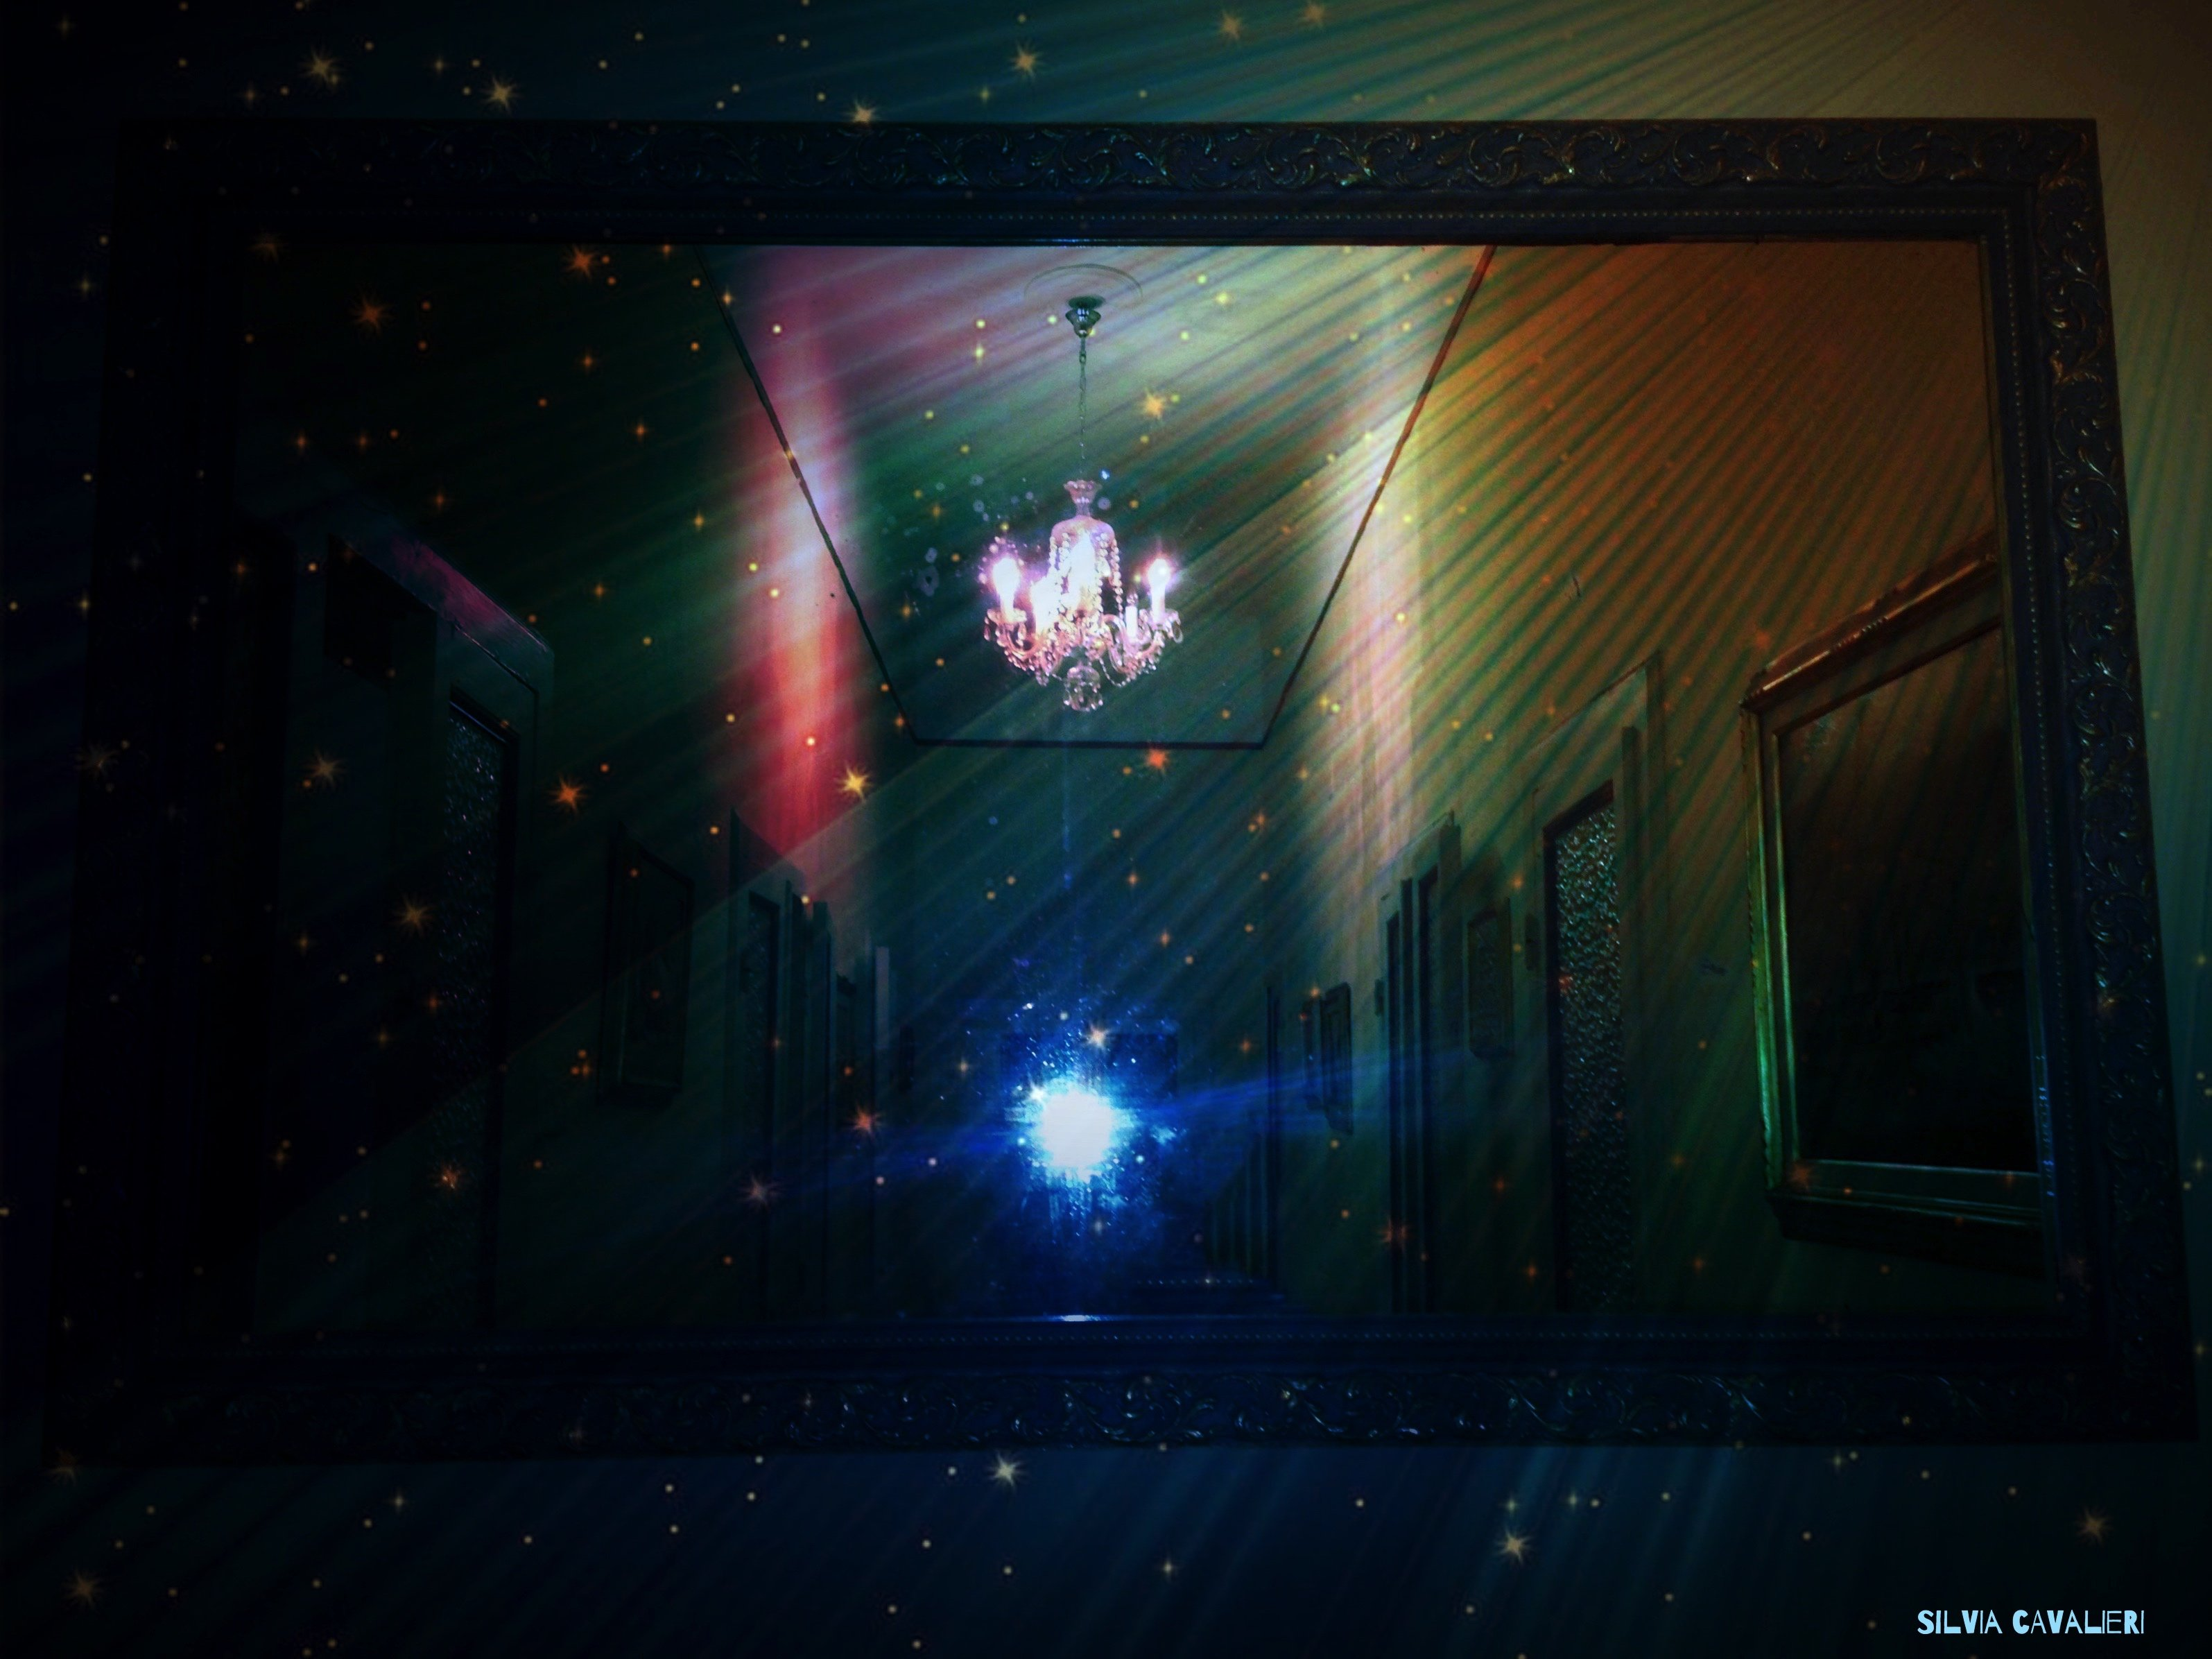 stelle-in-corridoio